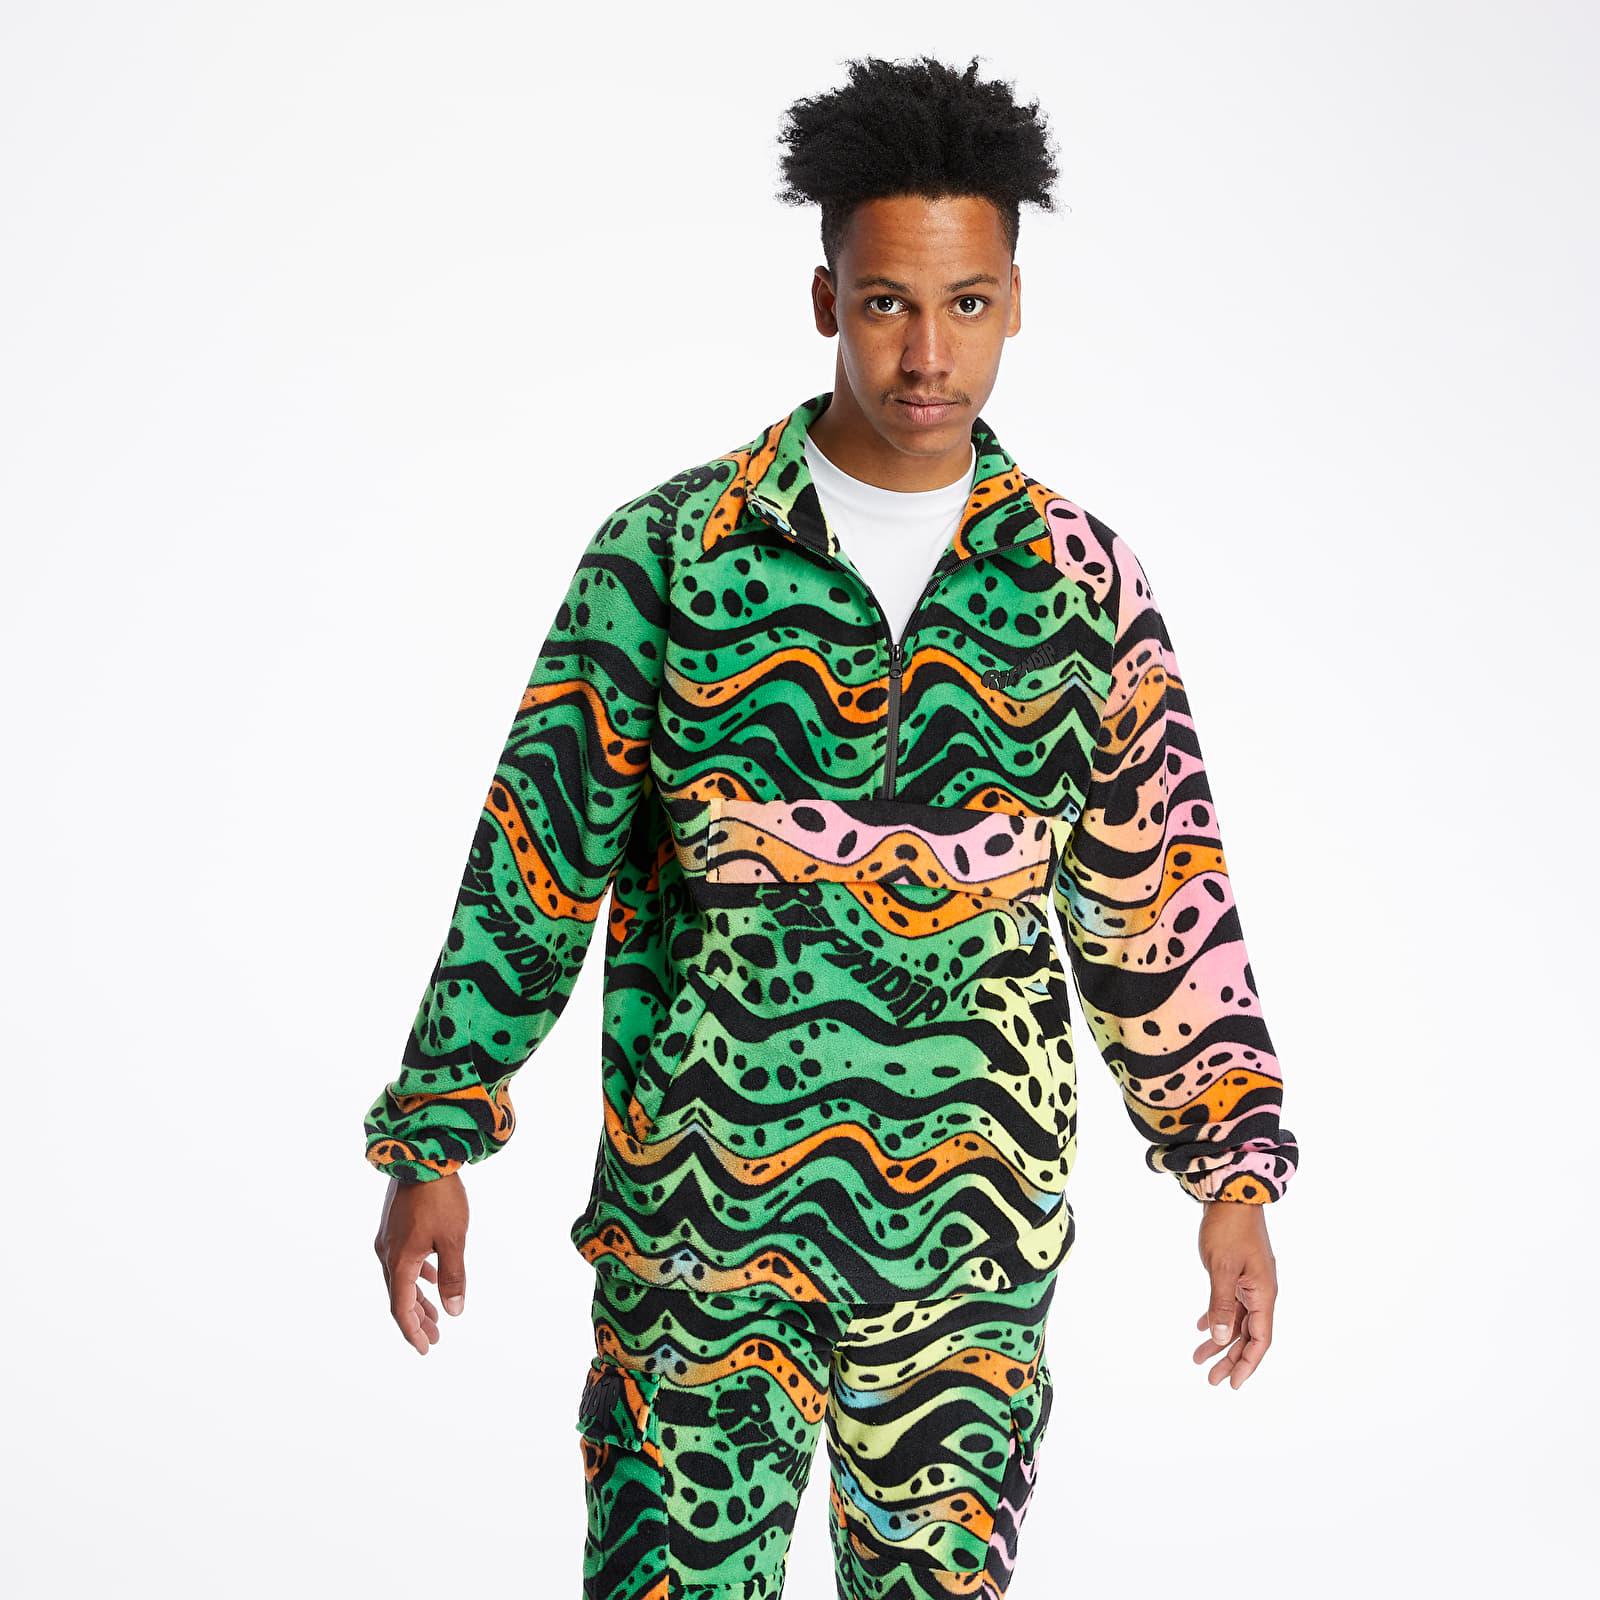 Mikiny a svetry RIPNDIP Ripple Brushed Fleece Half Zip Jacket Multicolor